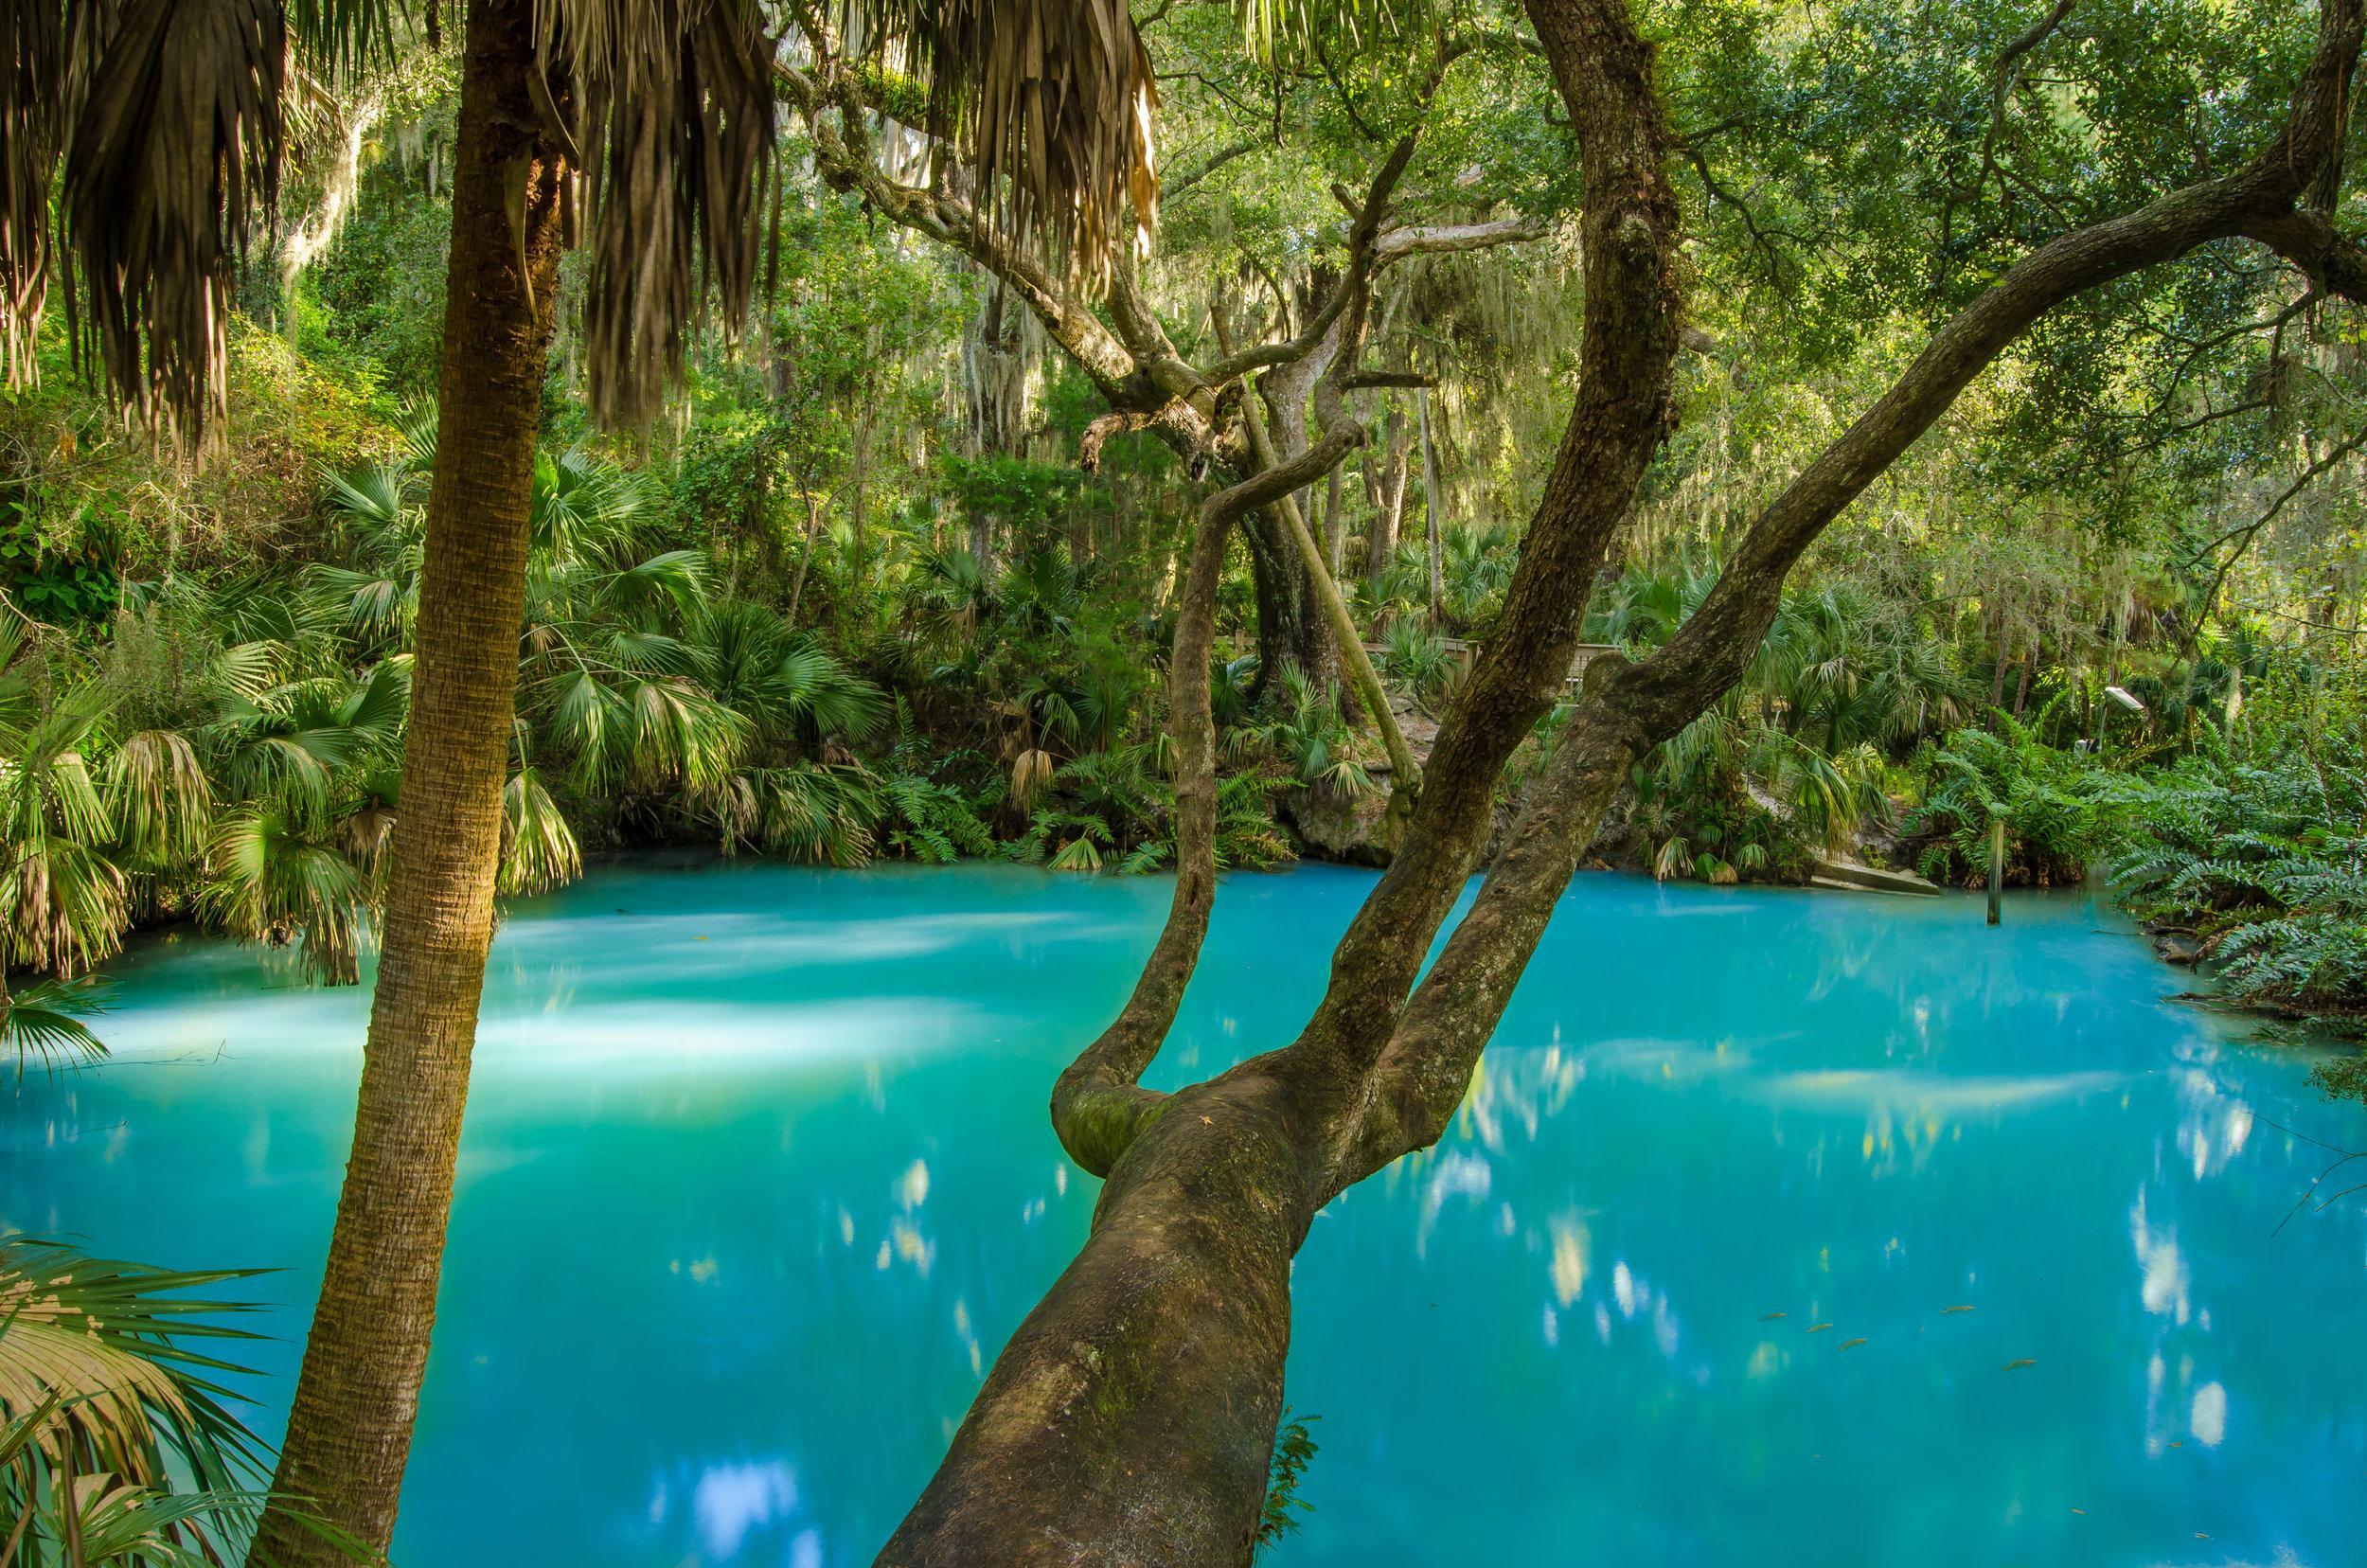 Green Spring-spring-tropical-water-Florida-Volusia County.jpg